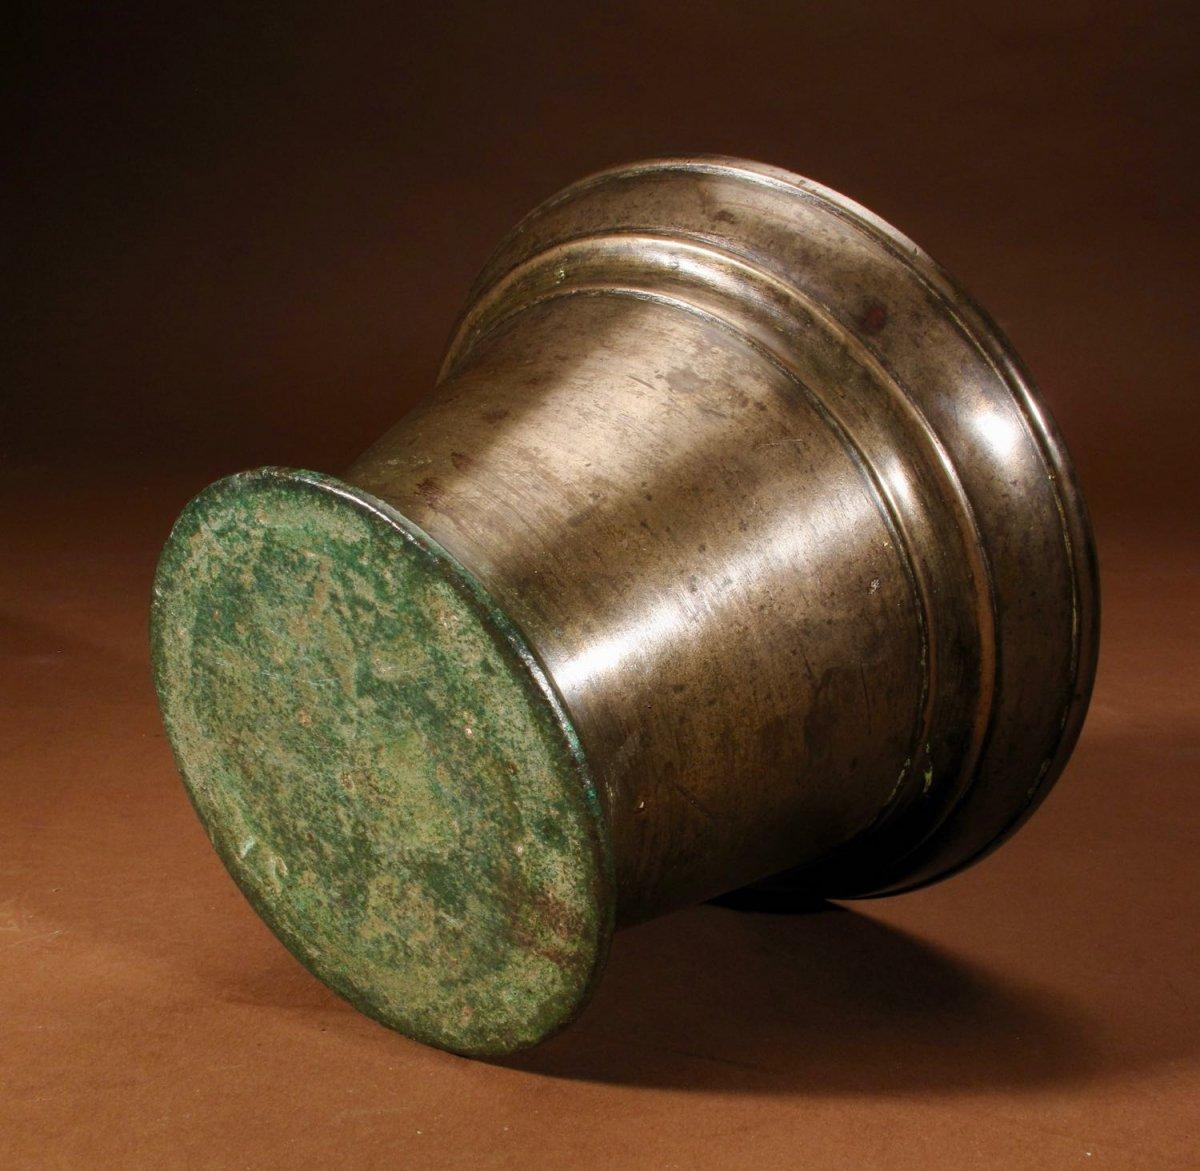 Un Beau Mortier En Bronze Uni, Continental, XVIIe / XVIIIe Siècle-photo-4